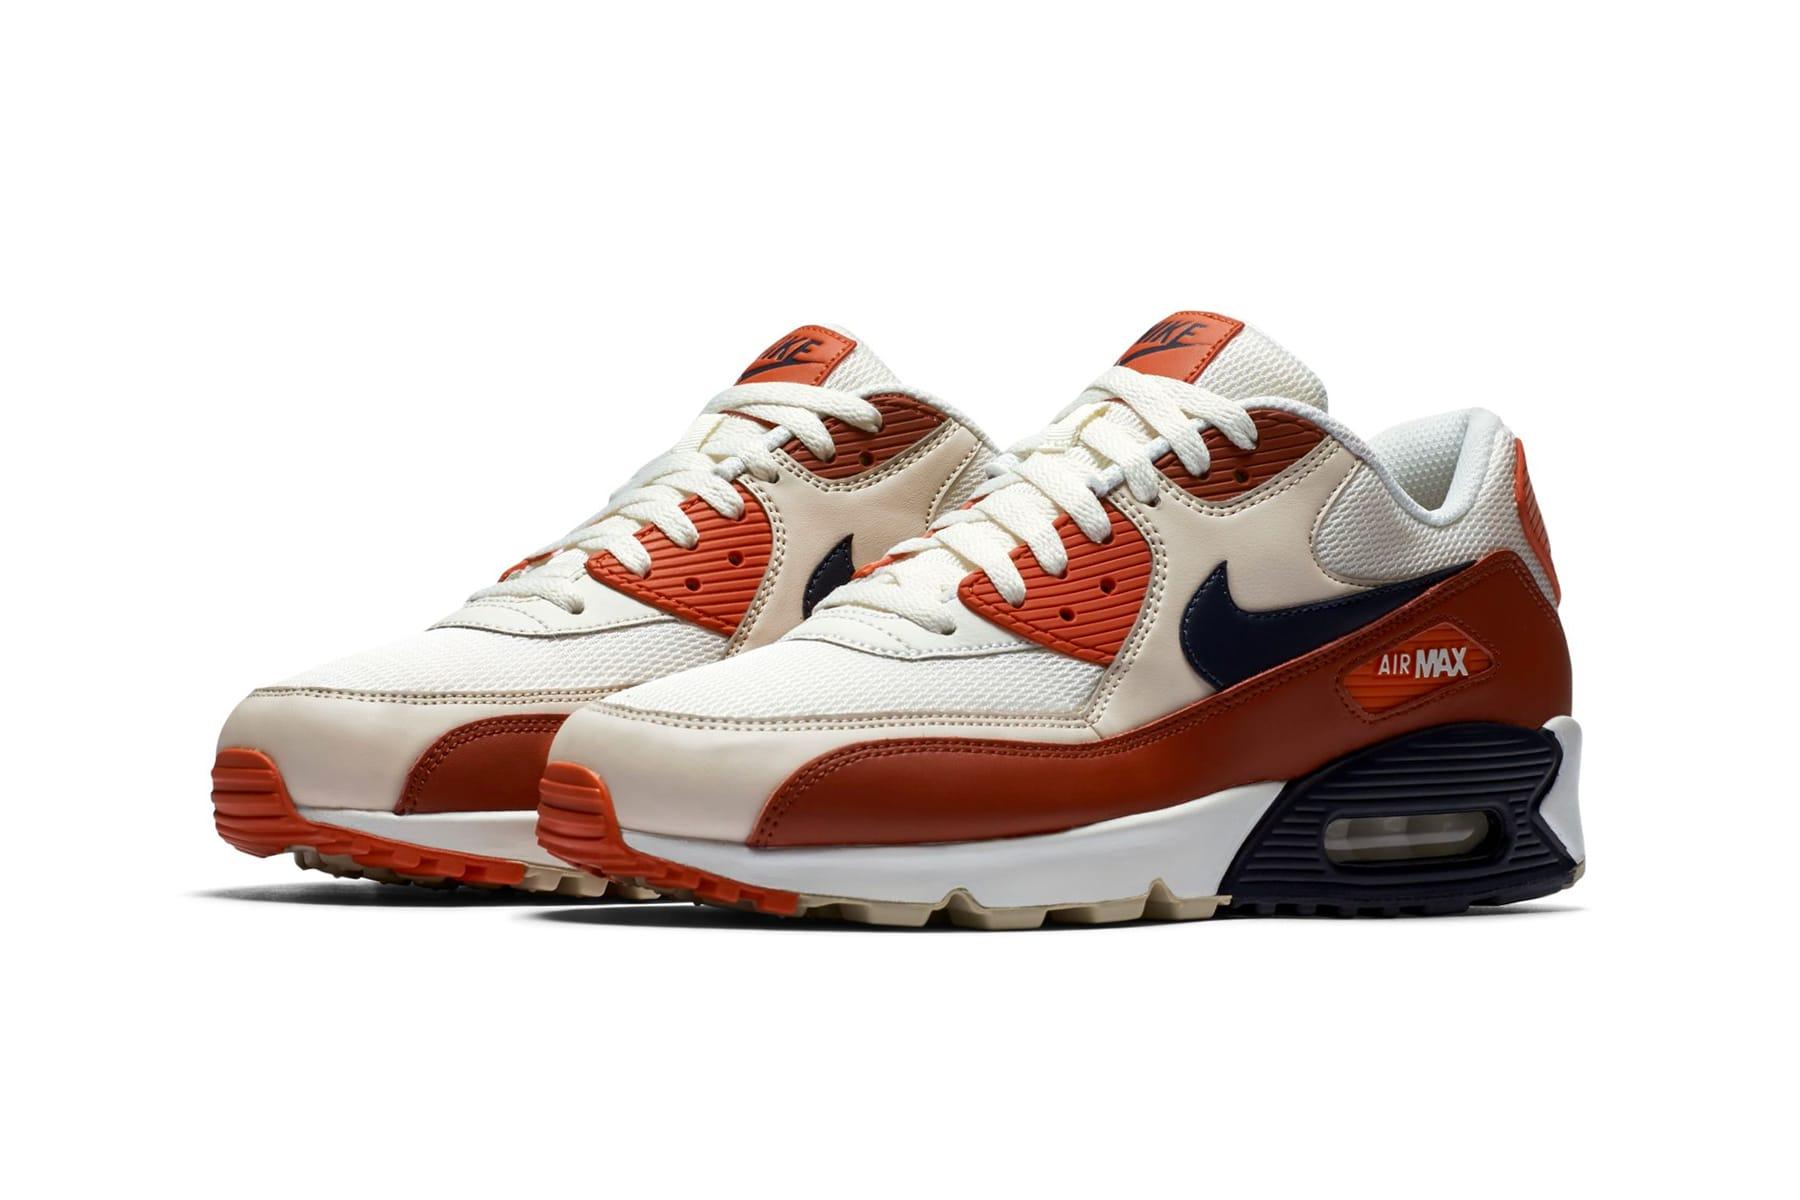 Nike Air Max 90 Essential New Colorways